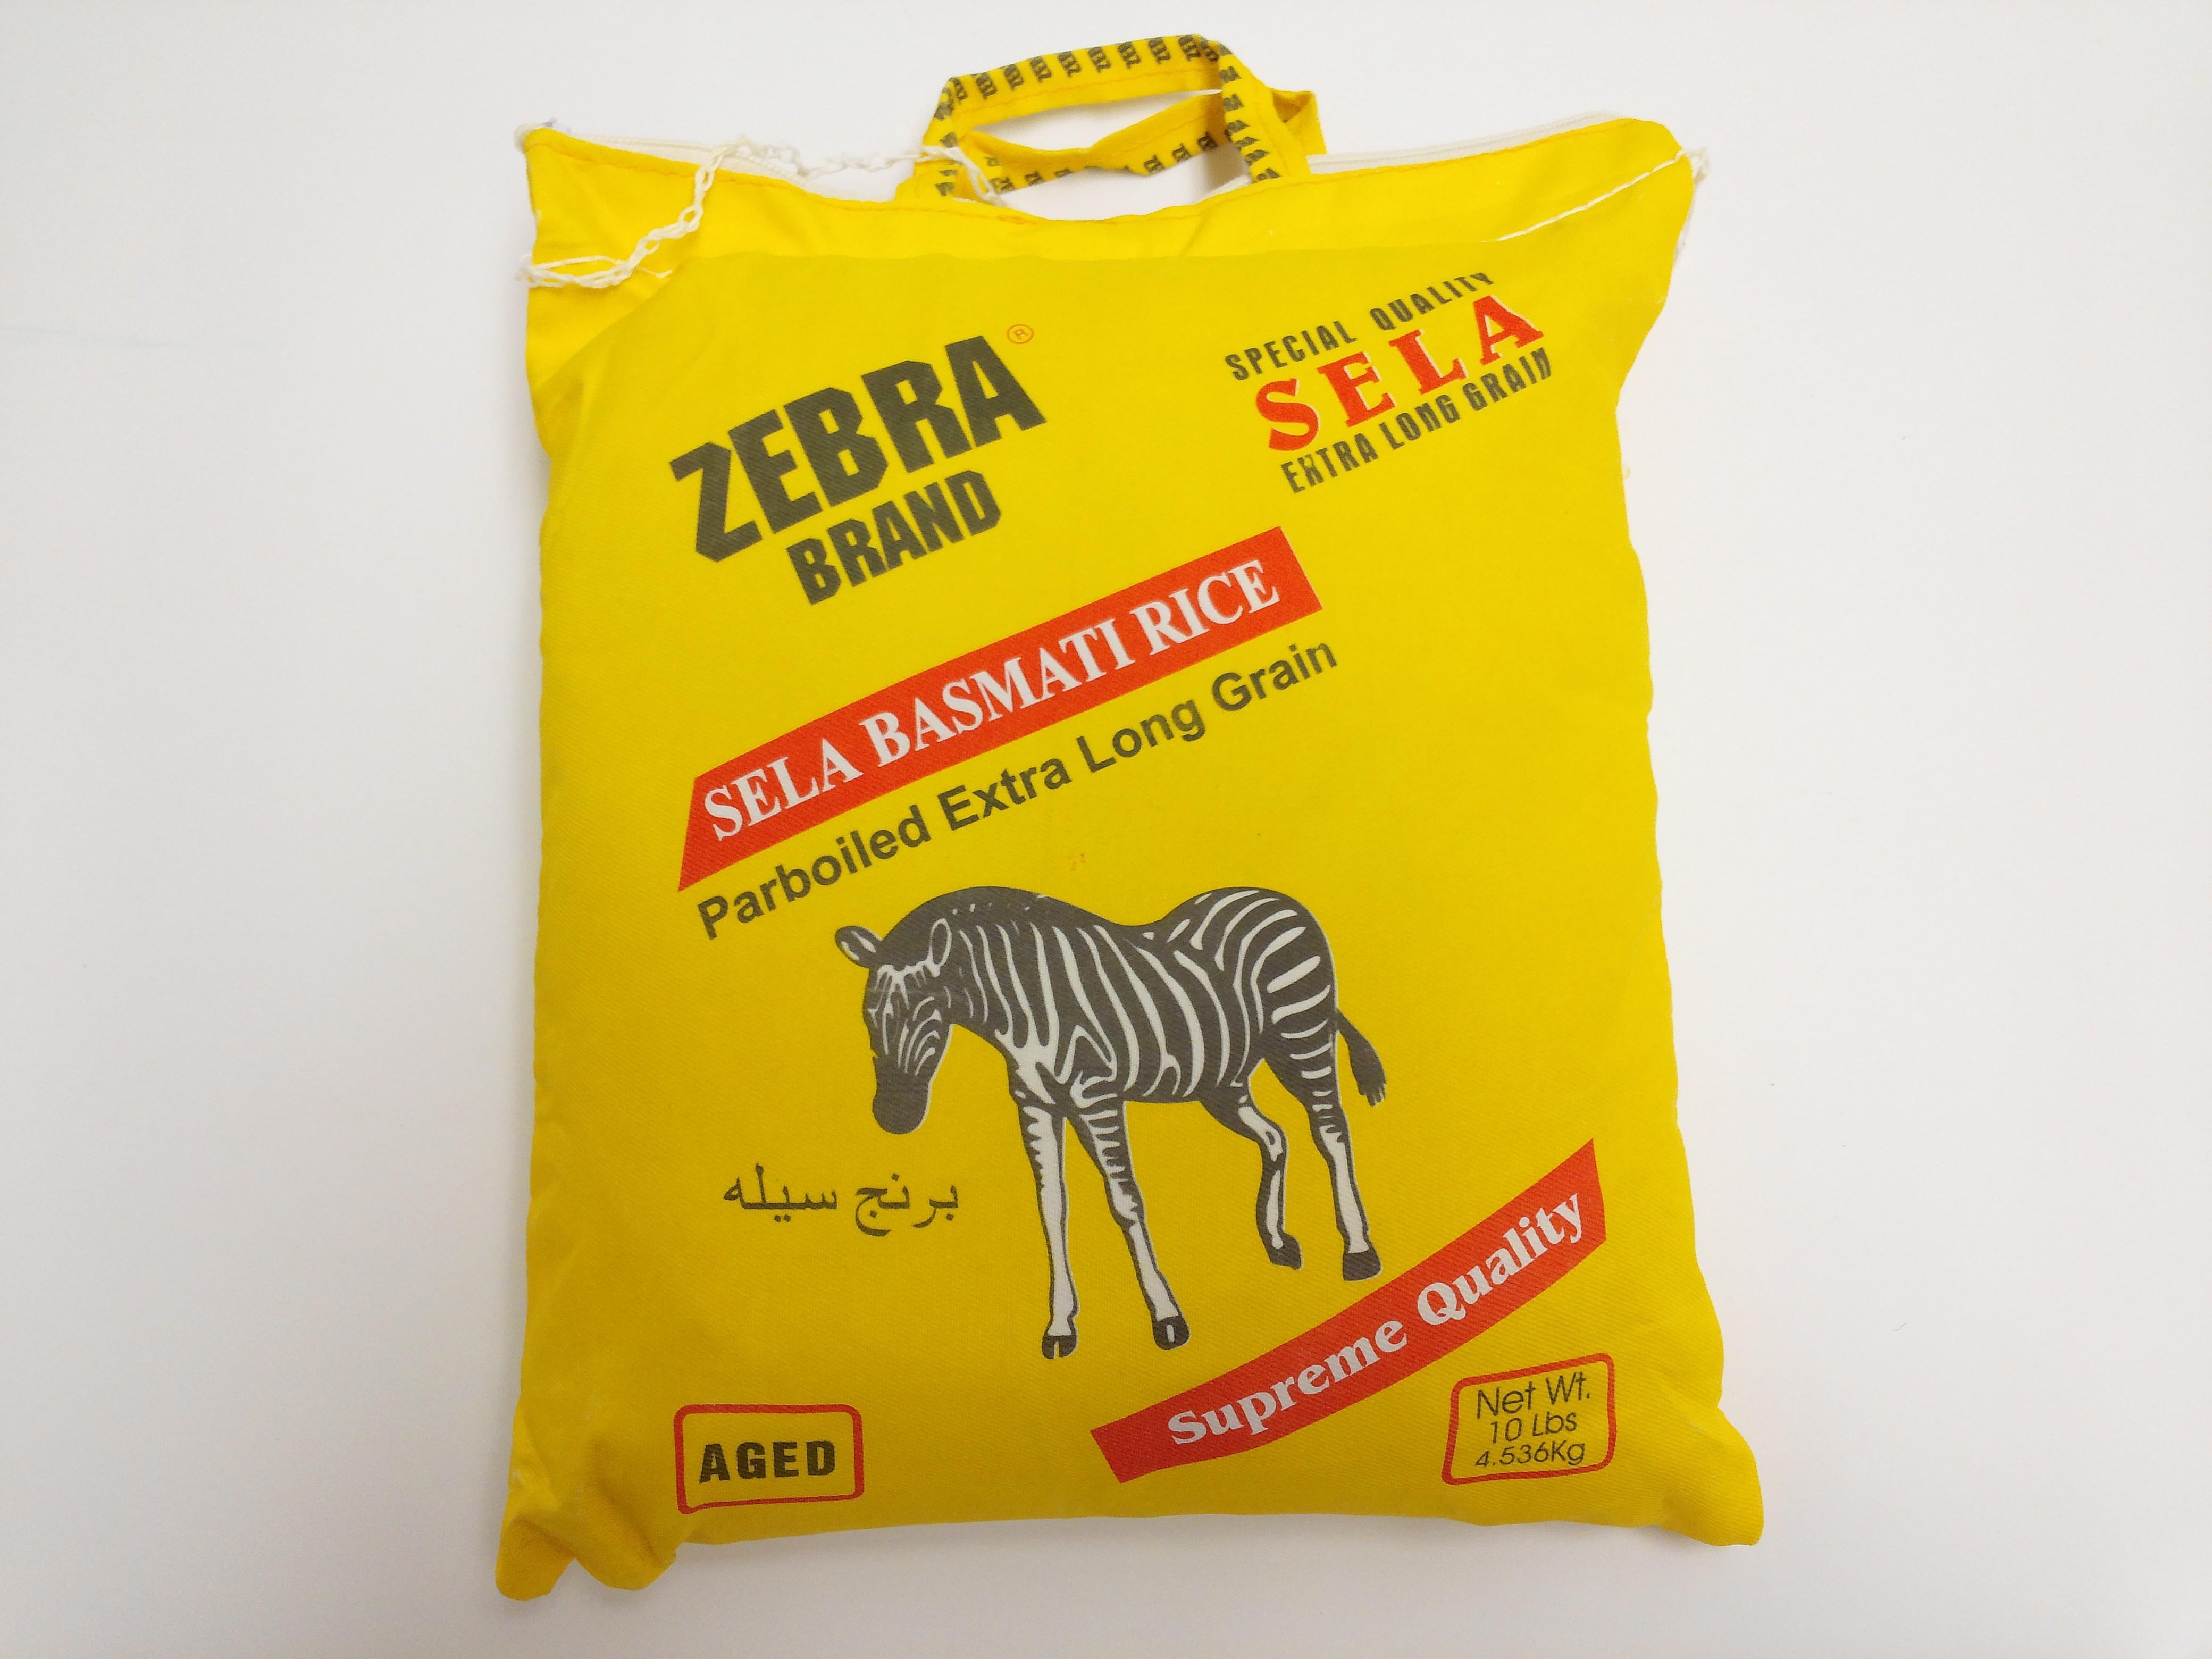 Zebra Sela Basmati Rice 10lb